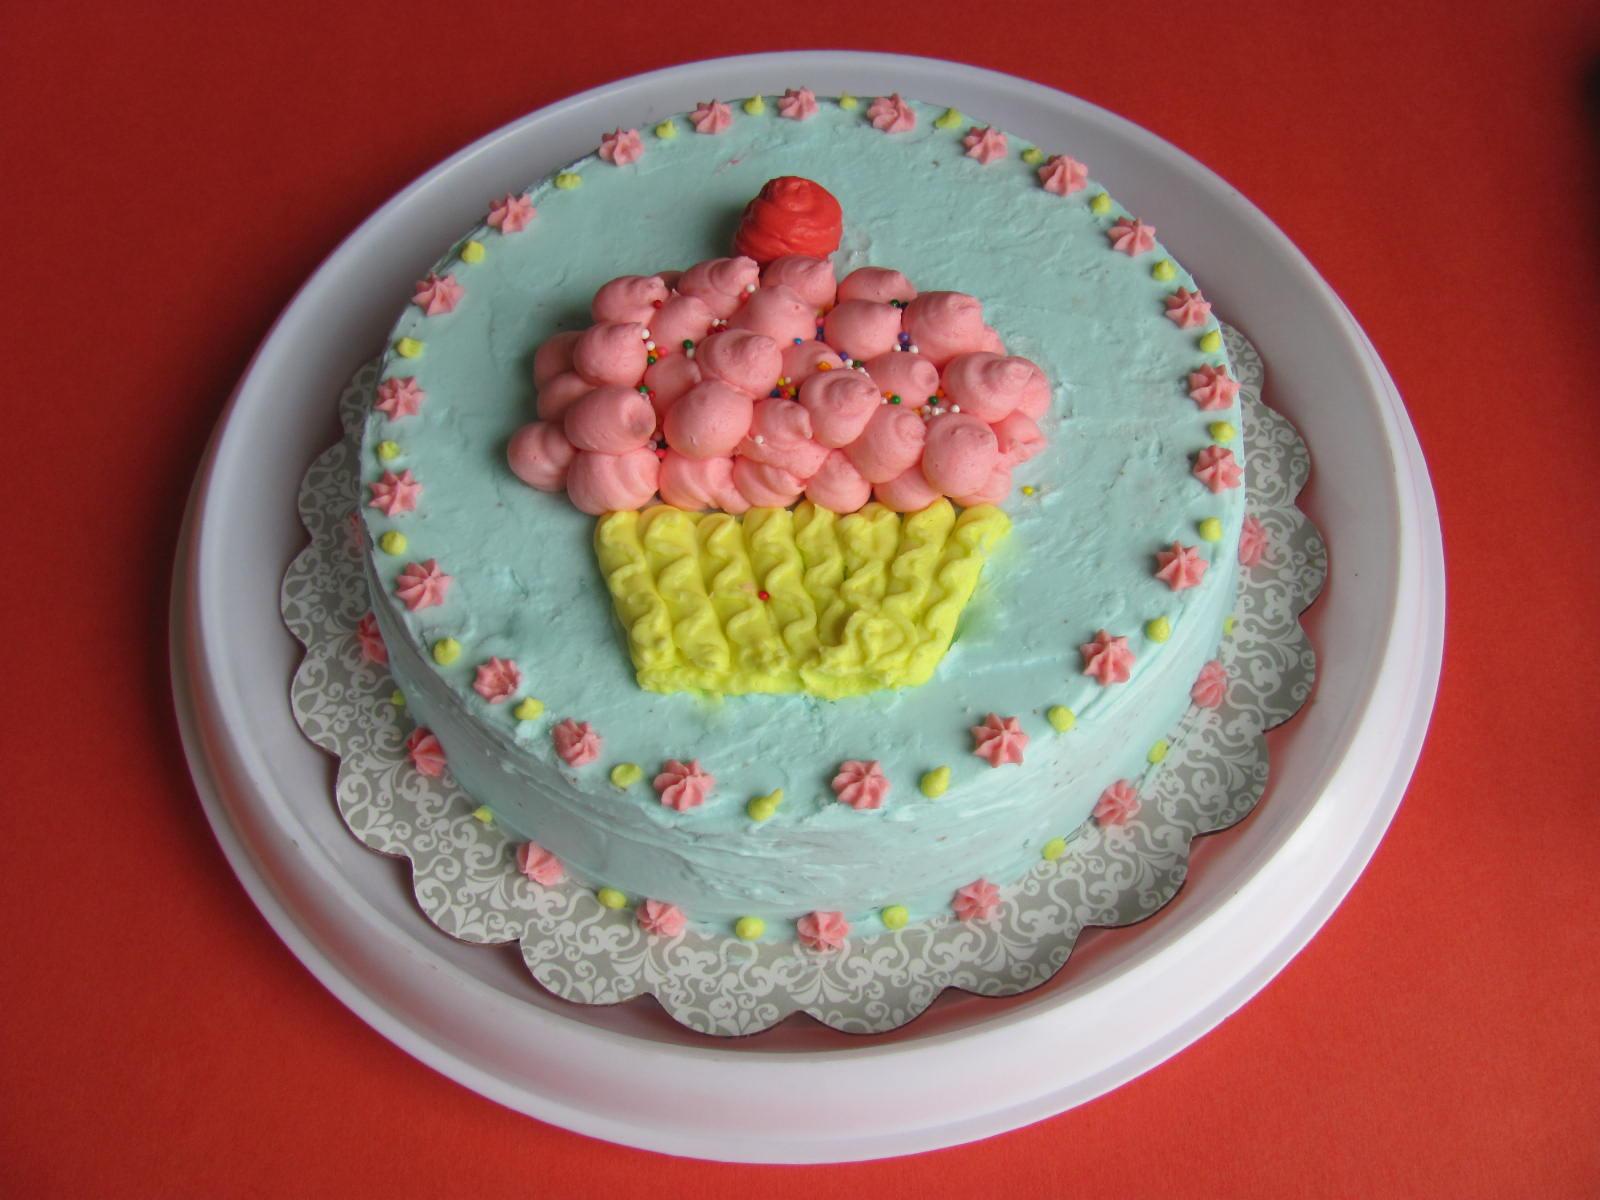 Wilton Cake Decorating Buttercream Recipe : Wilton Cake Decorating Classes - My Culinary Adventures